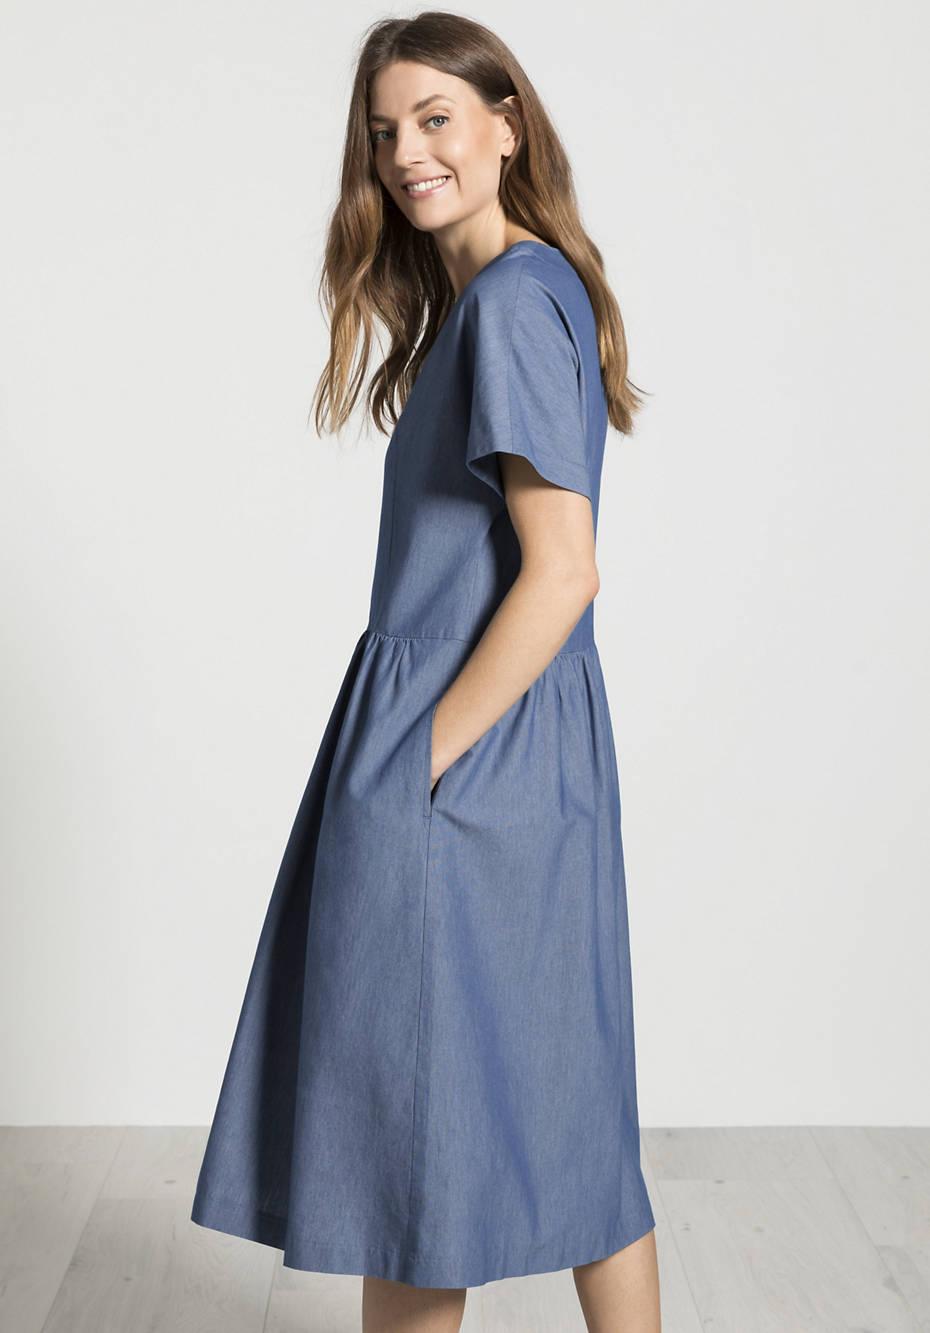 Banana fiber dress with organic cotton